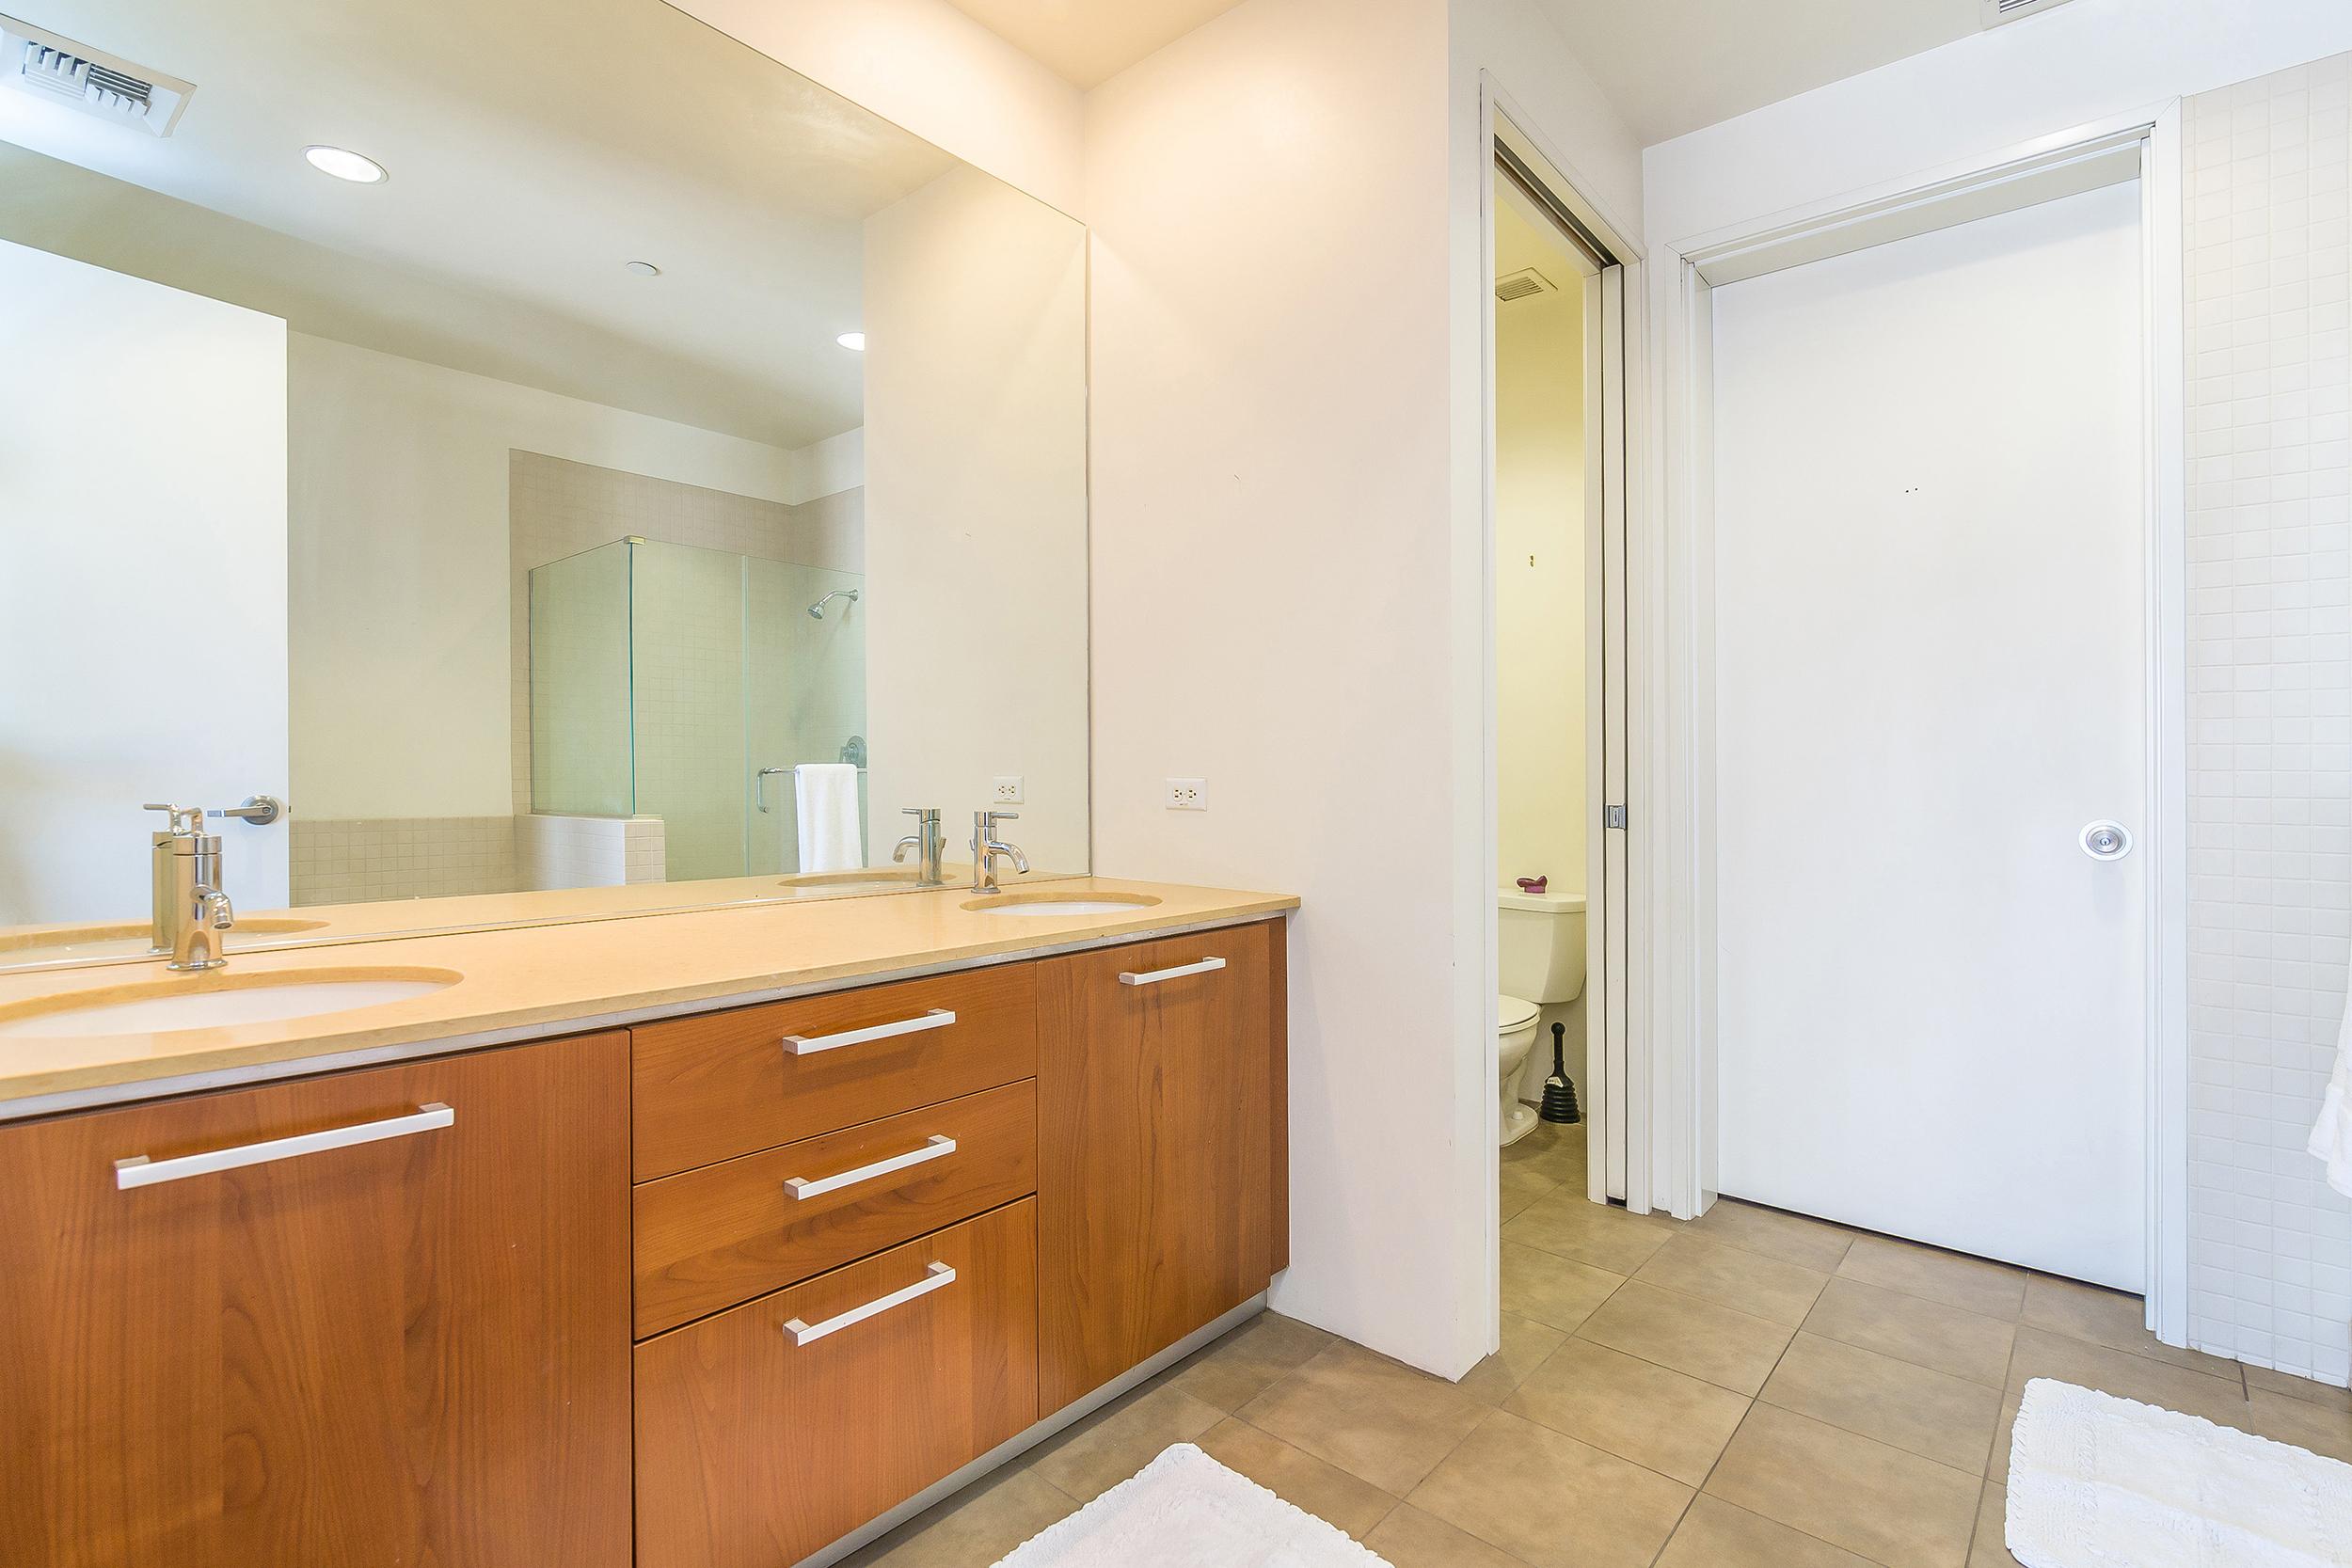 023-Bathroom-3651144-large_2500x.jpg